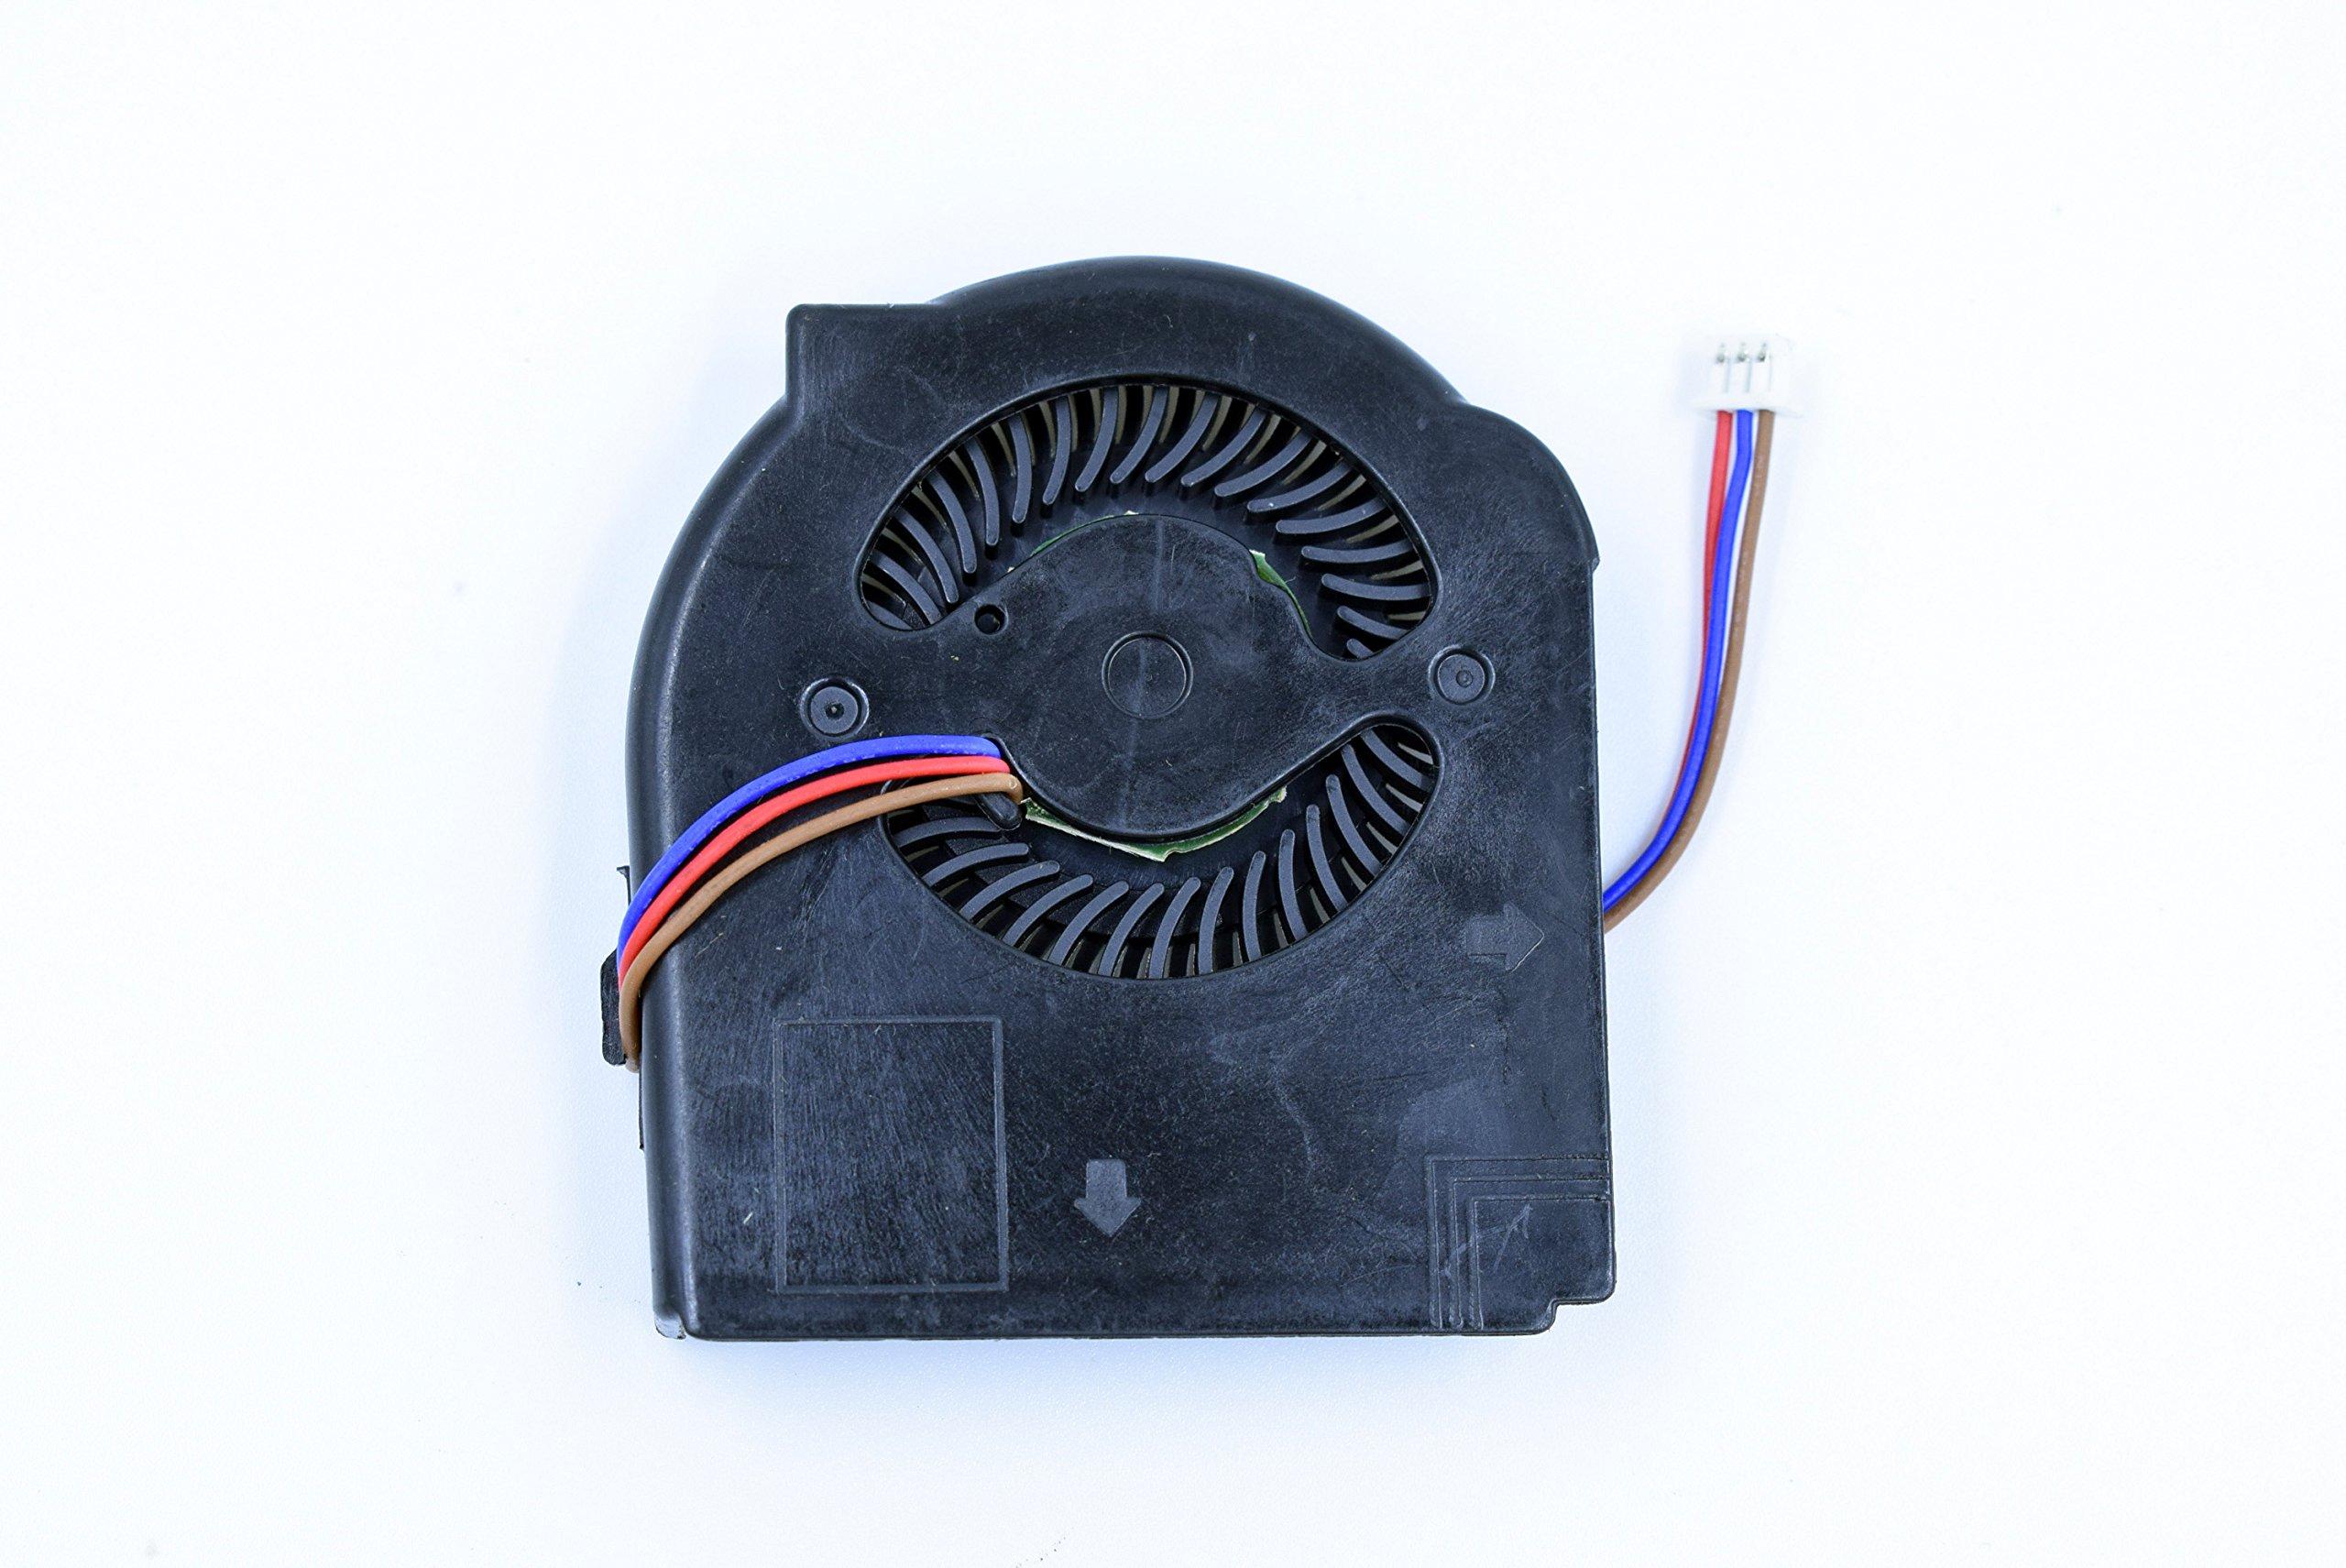 Cheap Lenovo T410 Memory, find Lenovo T410 Memory deals on